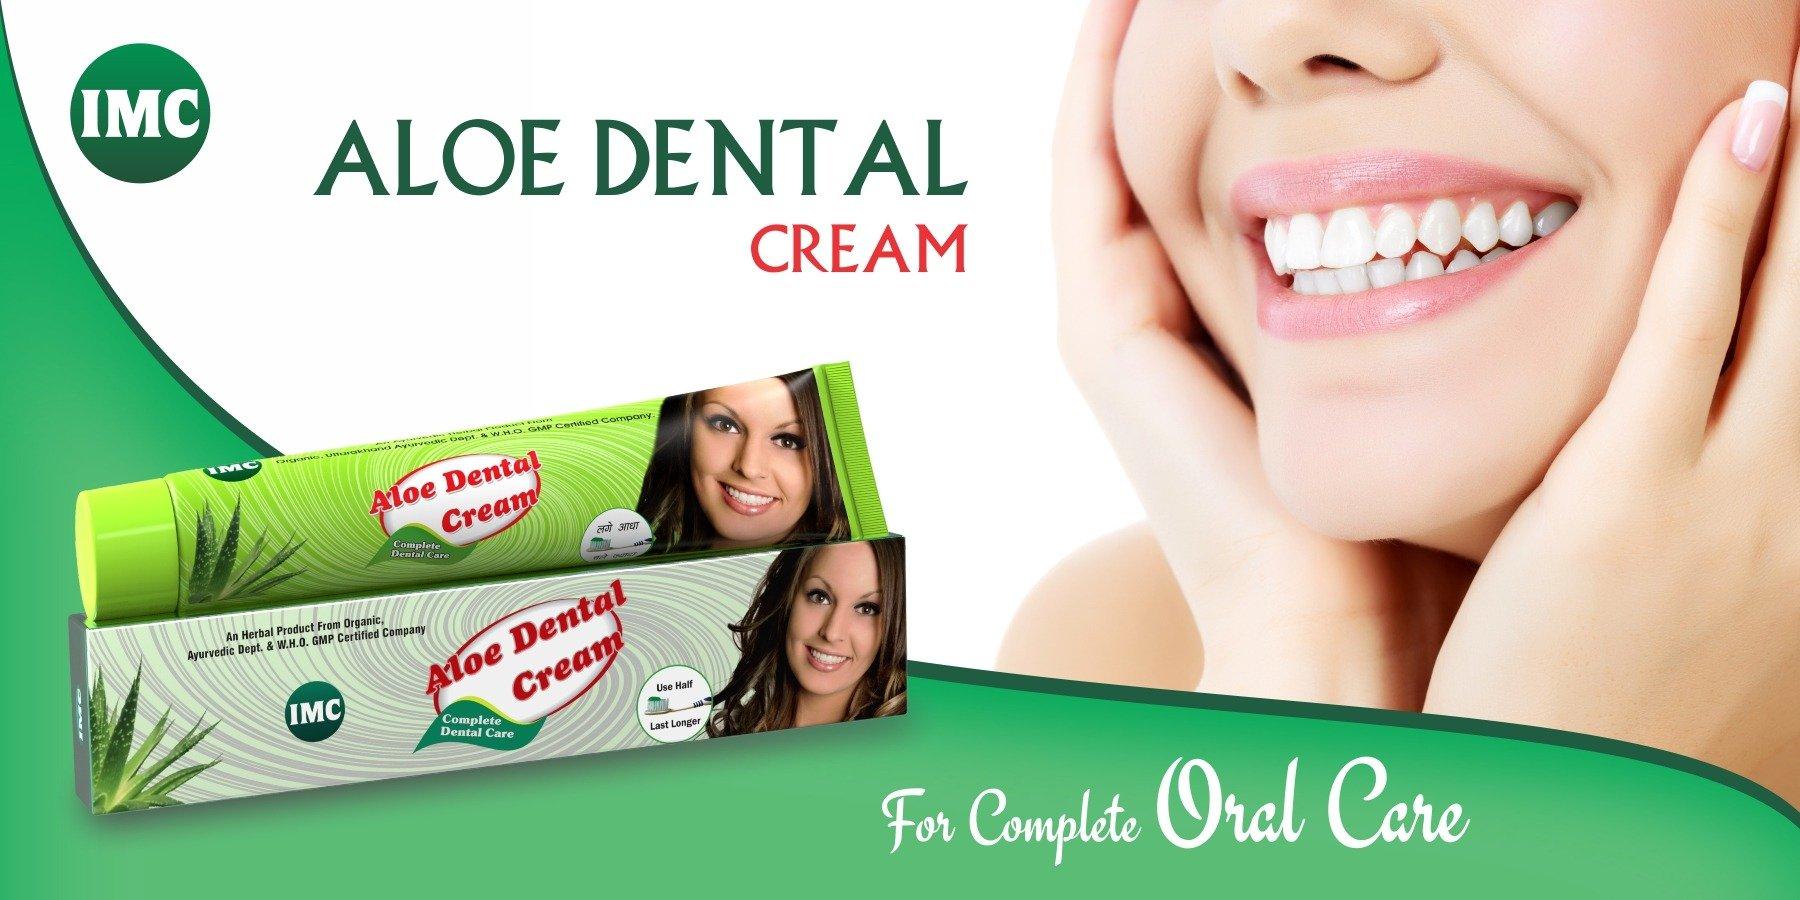 IMC Aloe Dental Cream